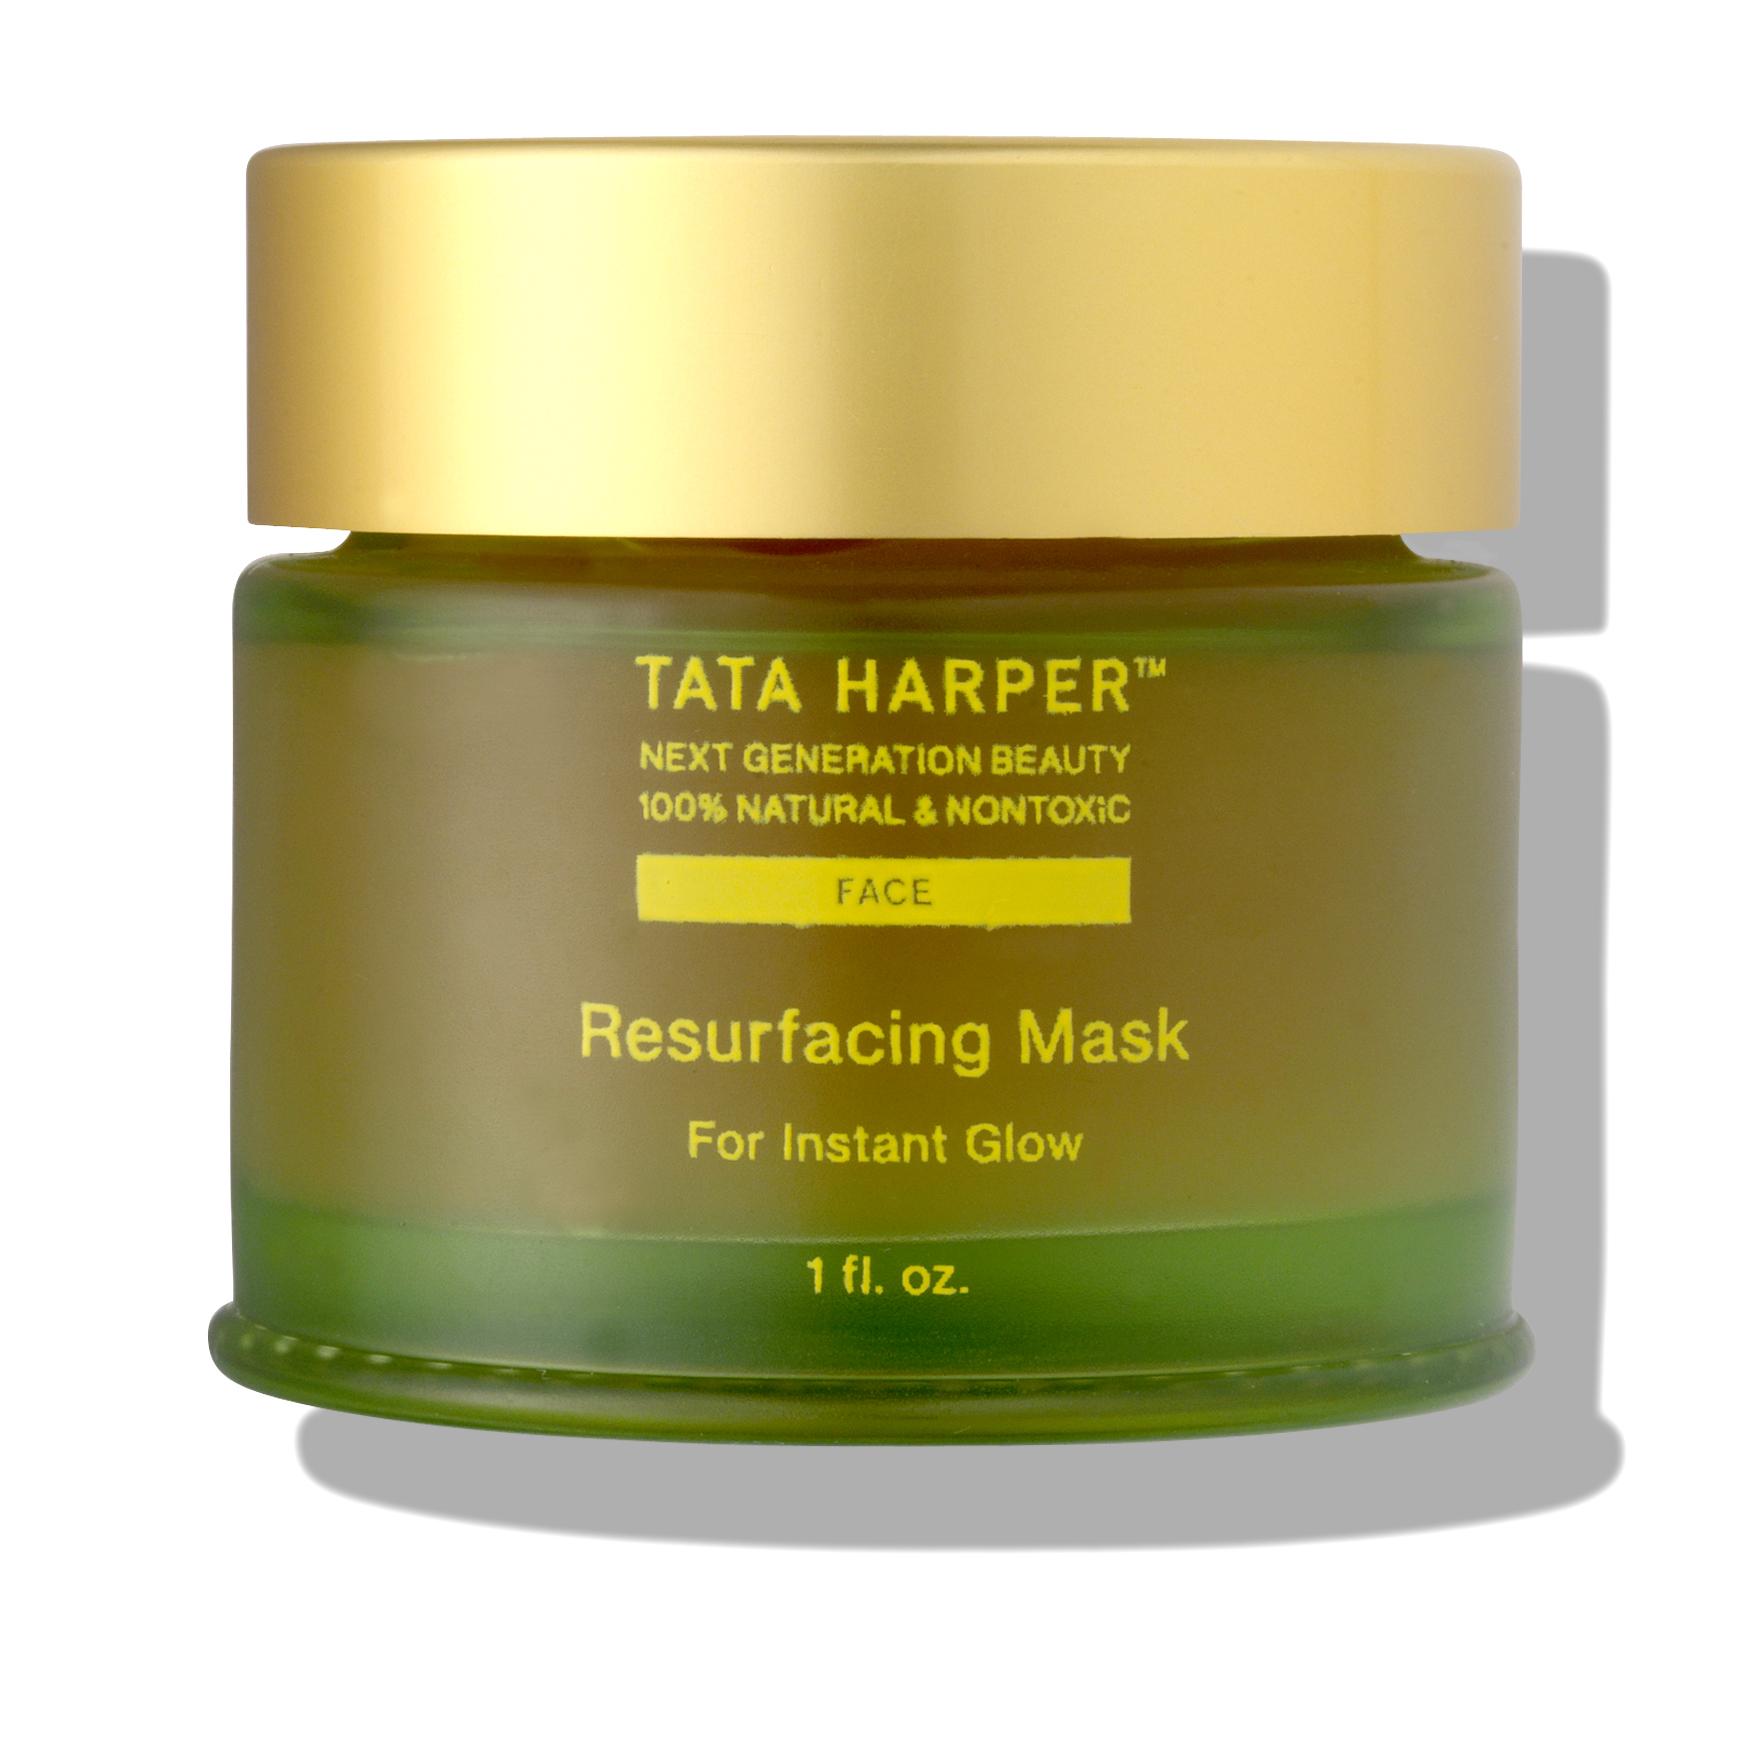 How It Works: Tata Harper ResurfacingMask